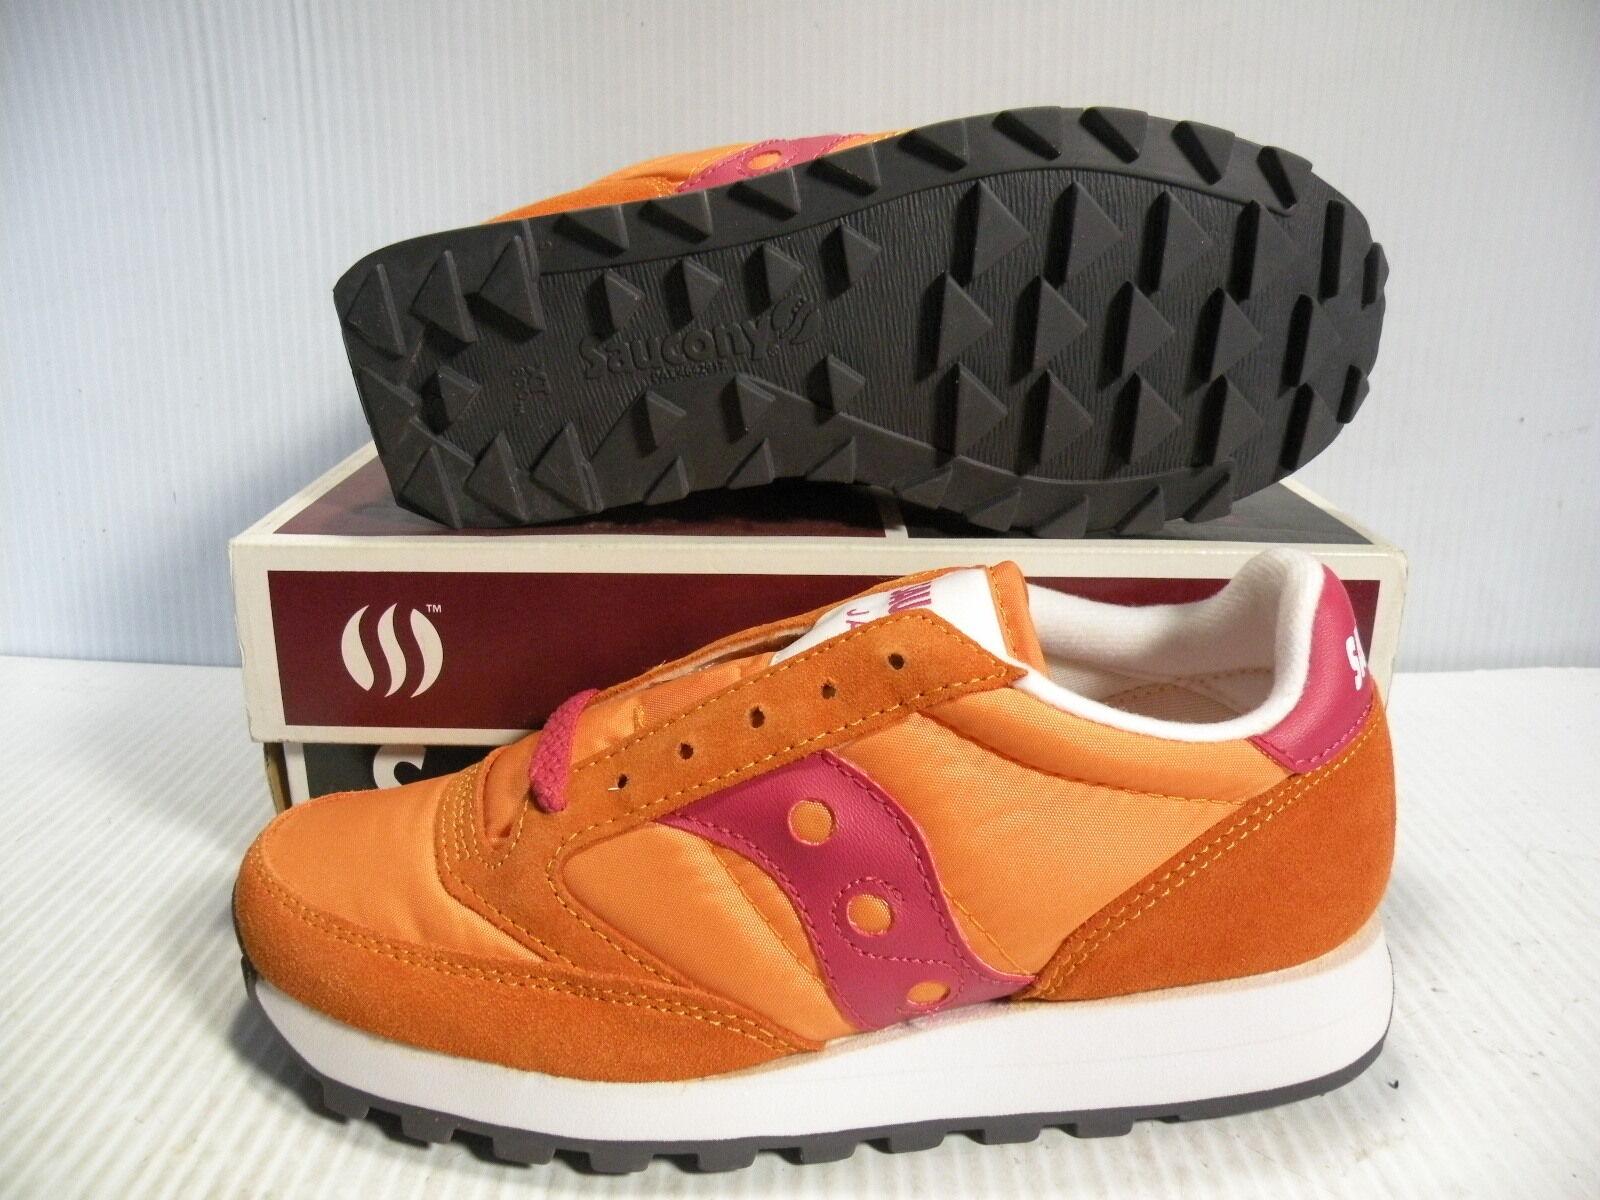 SAUCONY JAZZ ORIGINAL LOW SNEAKERS WOMEN SHOES orange RED 1044-92  SIZE 5.5 NEW